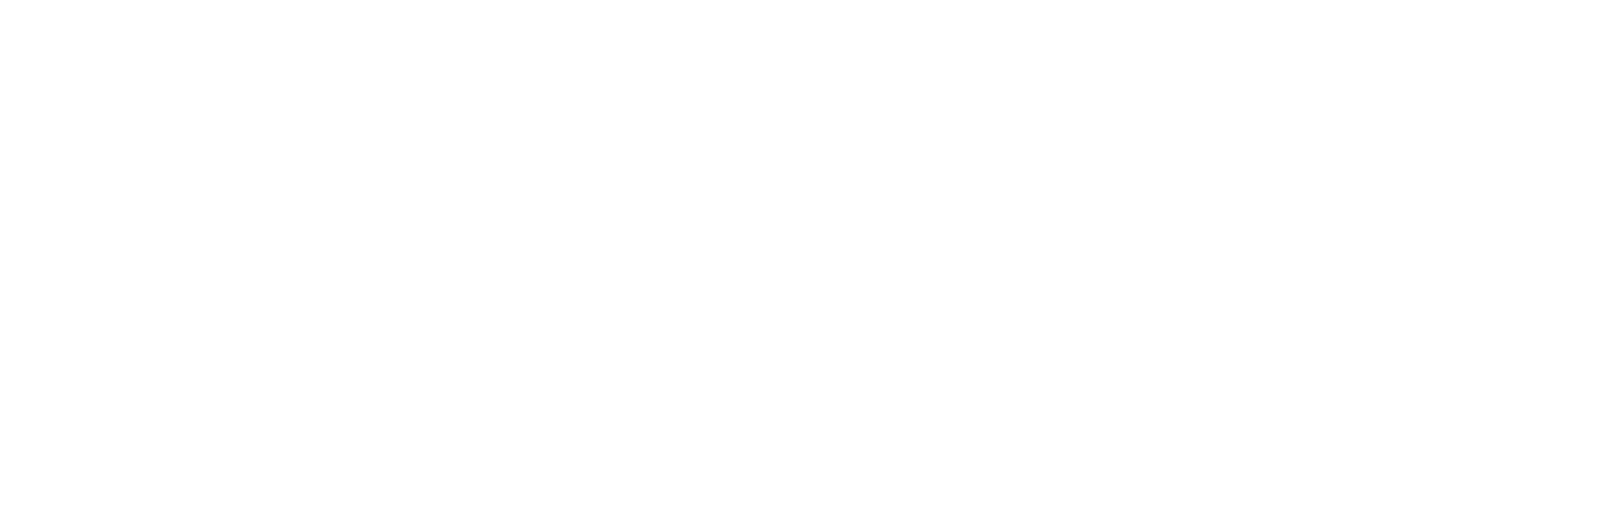 KESTREL LOGO WHITE TRANS 1600px